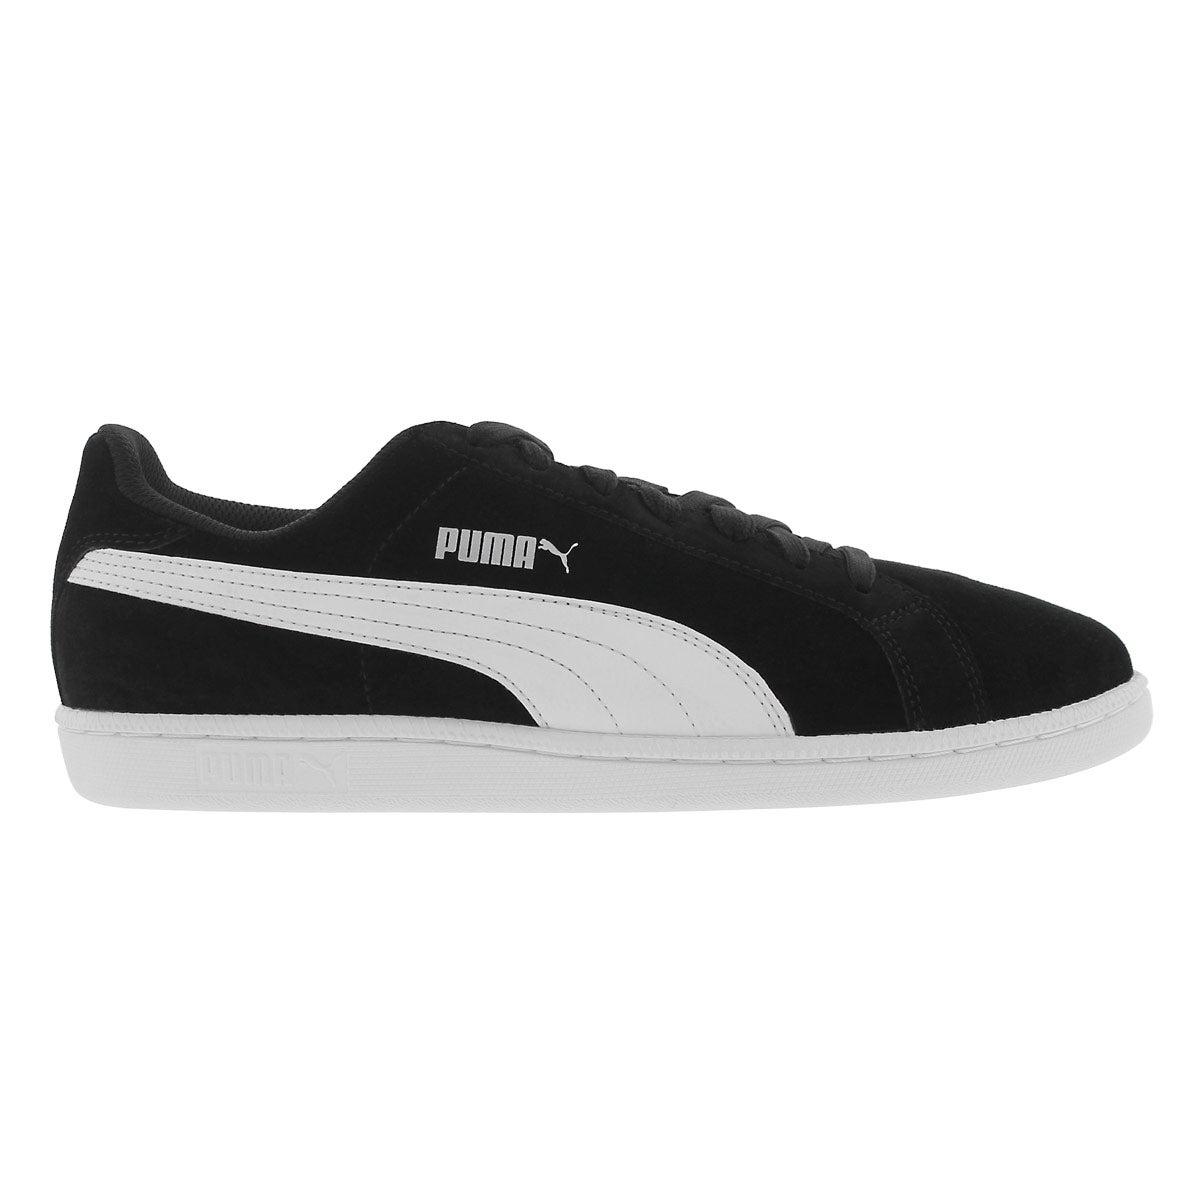 Mns Puma Smash black/white sneaker